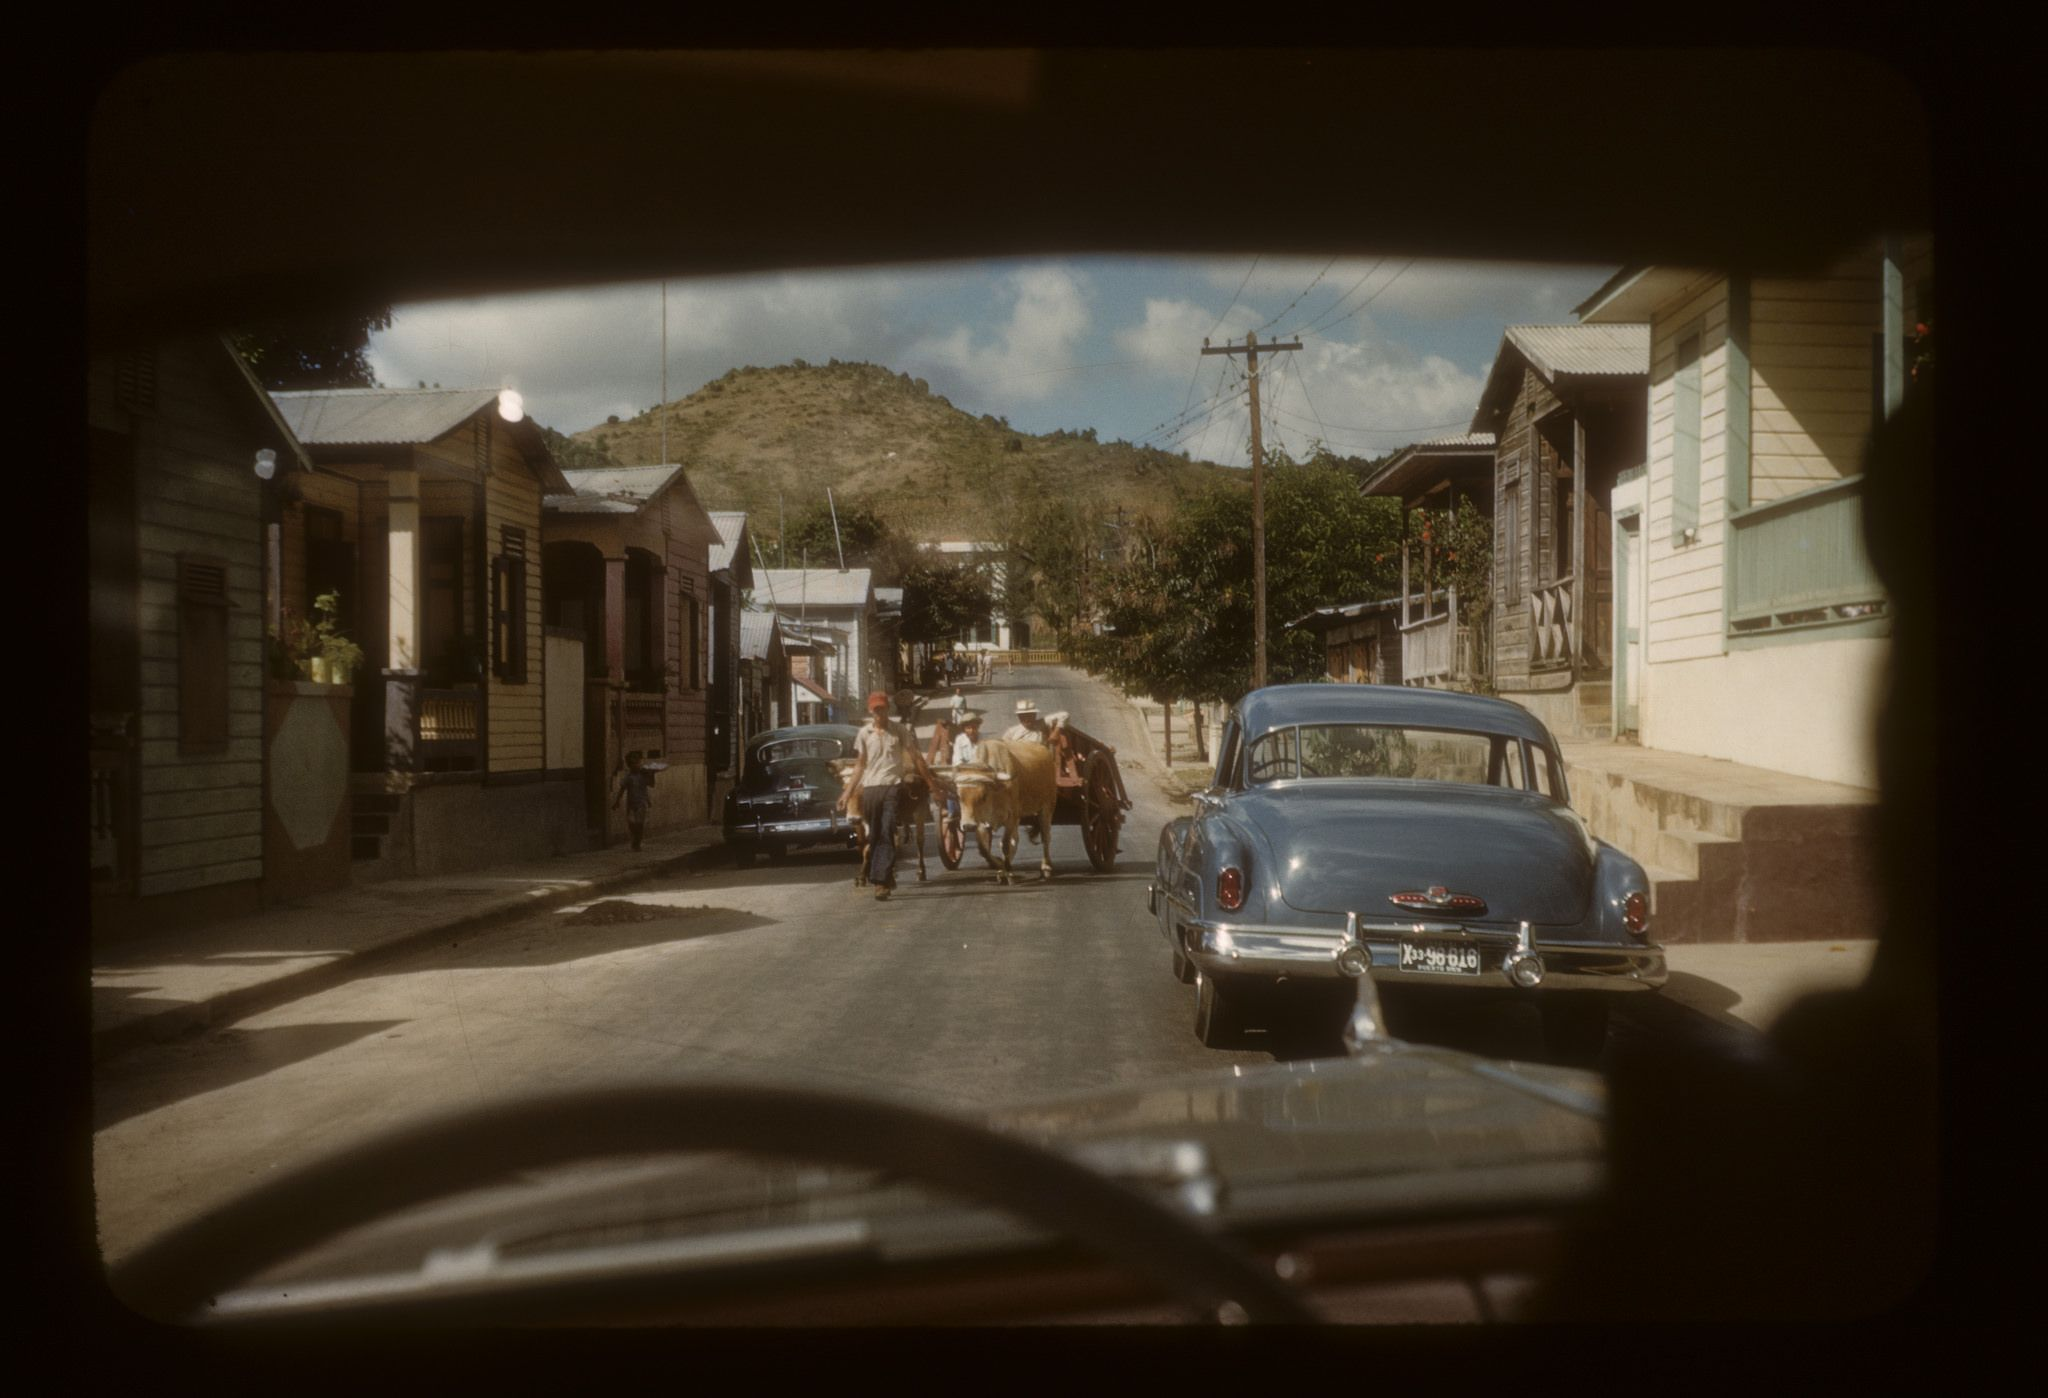 https://flic.kr/p/qHDQMk | CB38--Ox team pulling cart on Aibonito street | Puerto Rico. Clarence Baer photo.